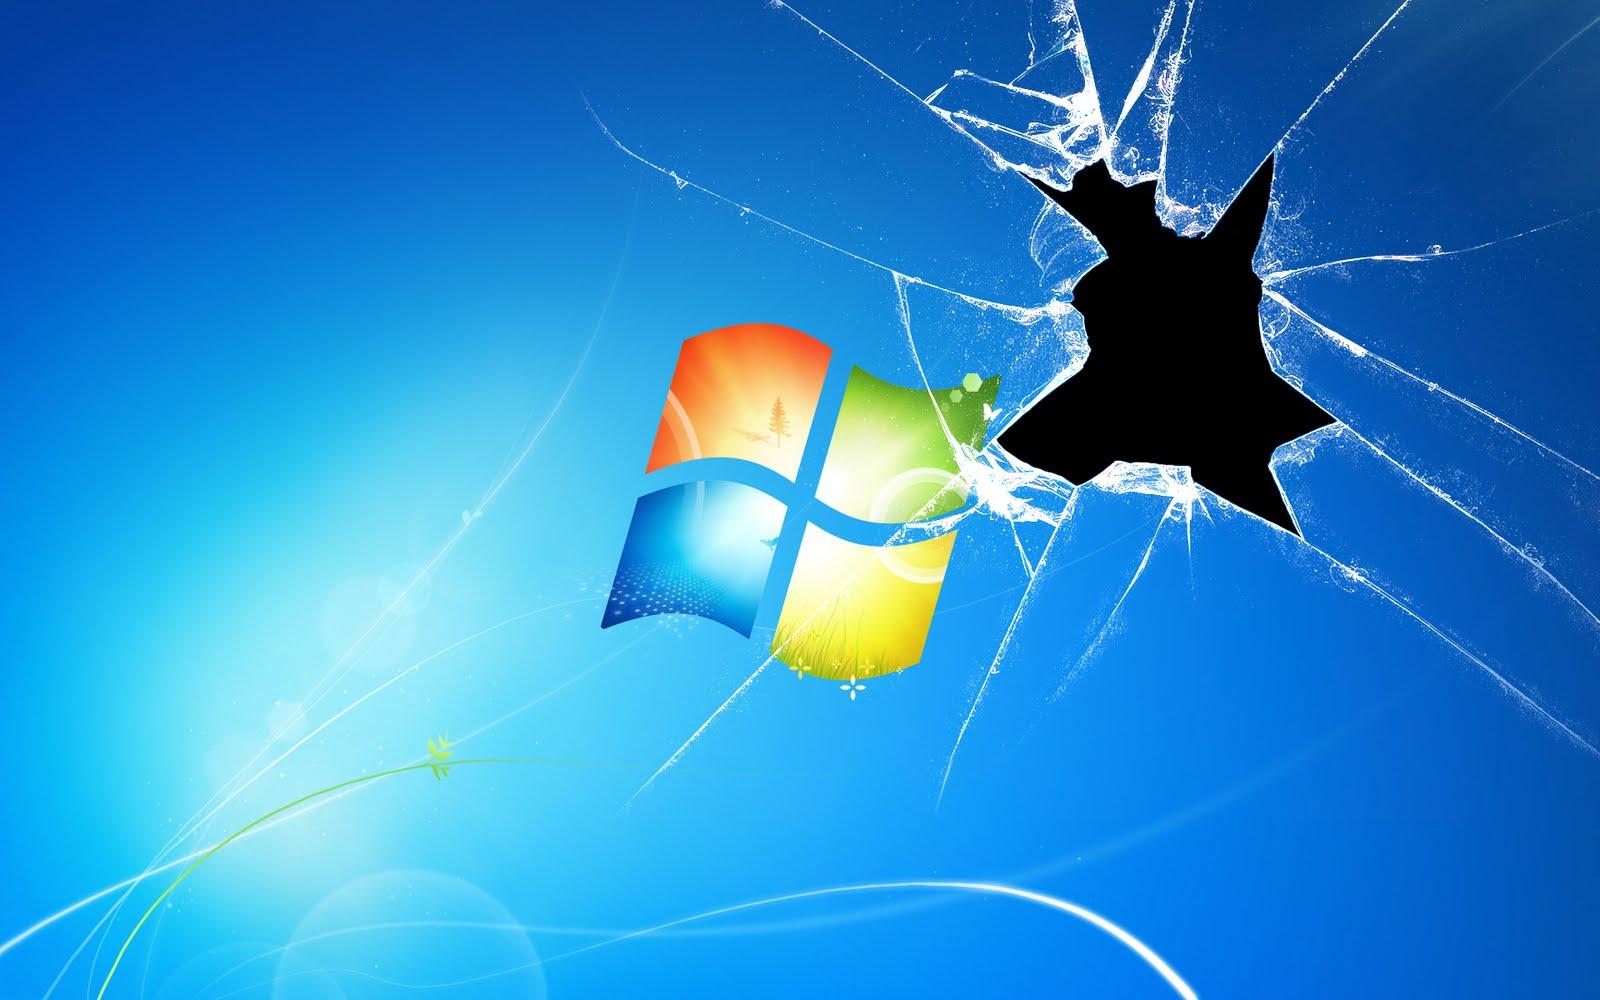 Nice windows 8 beta fish wallpapers for windows 10 desktop - Nice Windows 10 Wallpaper Wallpapersafari